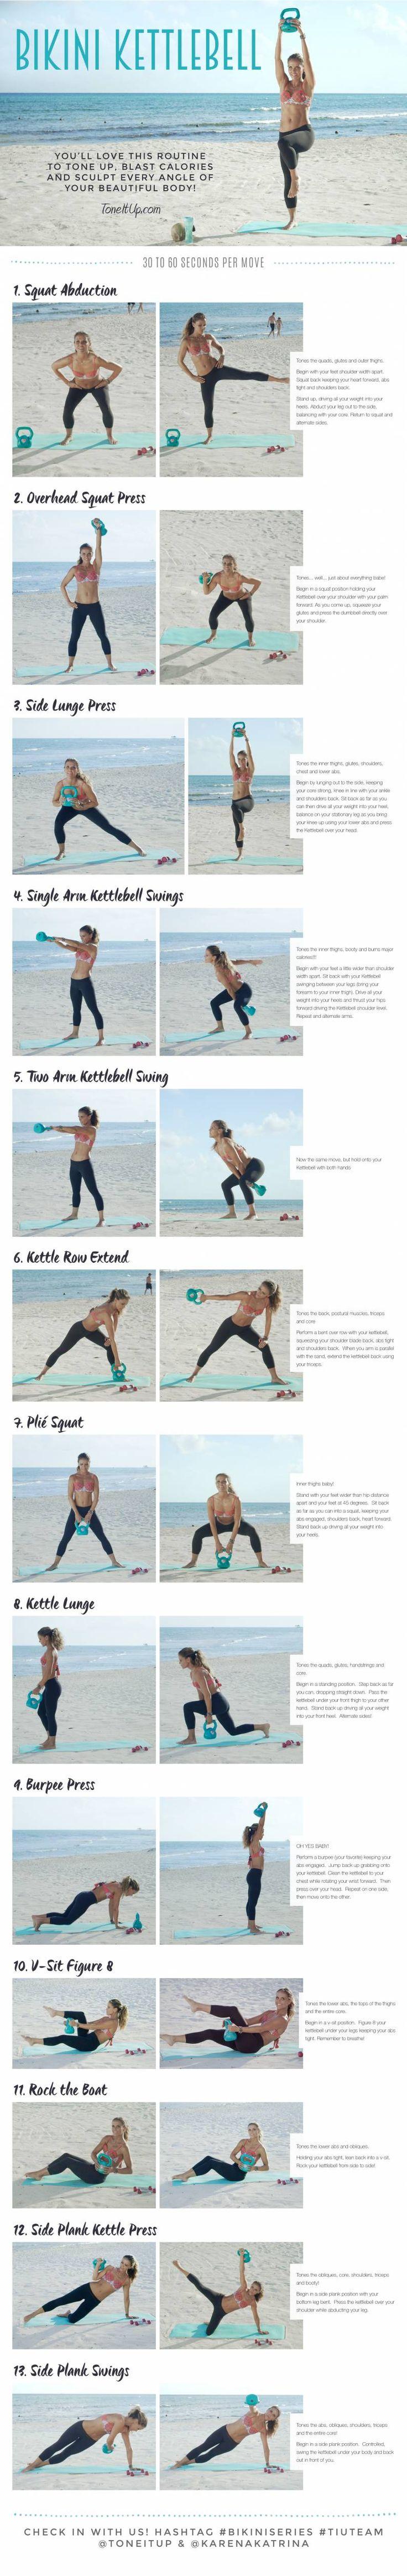 NEW Workout ~ BIKINI KETTLEBELL!                                                                                                                                                     More